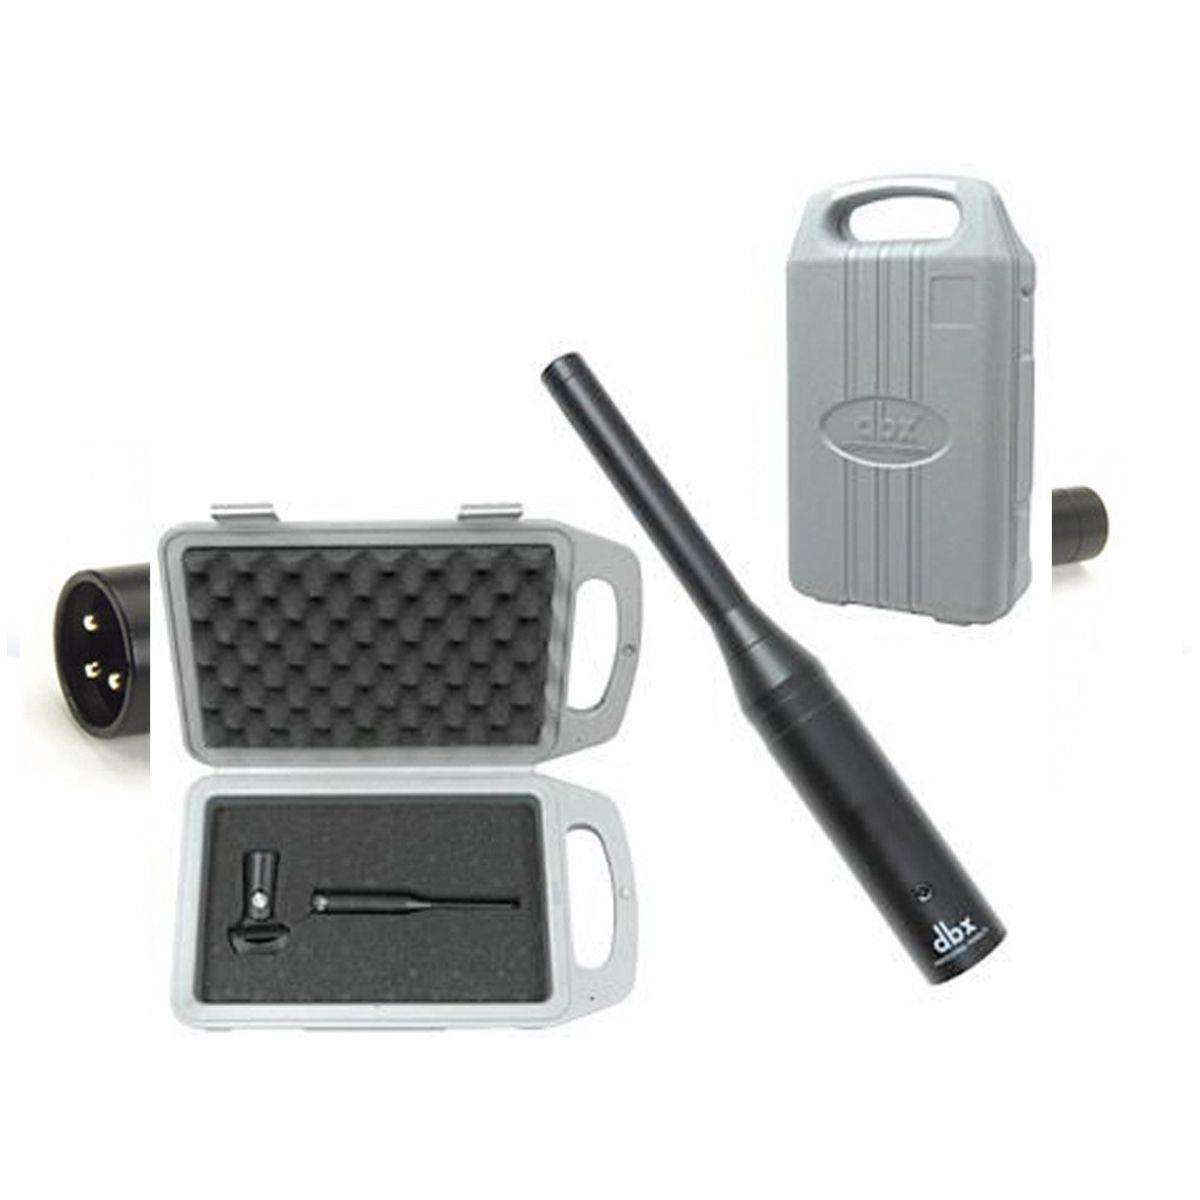 Microfone DBX RTA-M - Medição e Análise